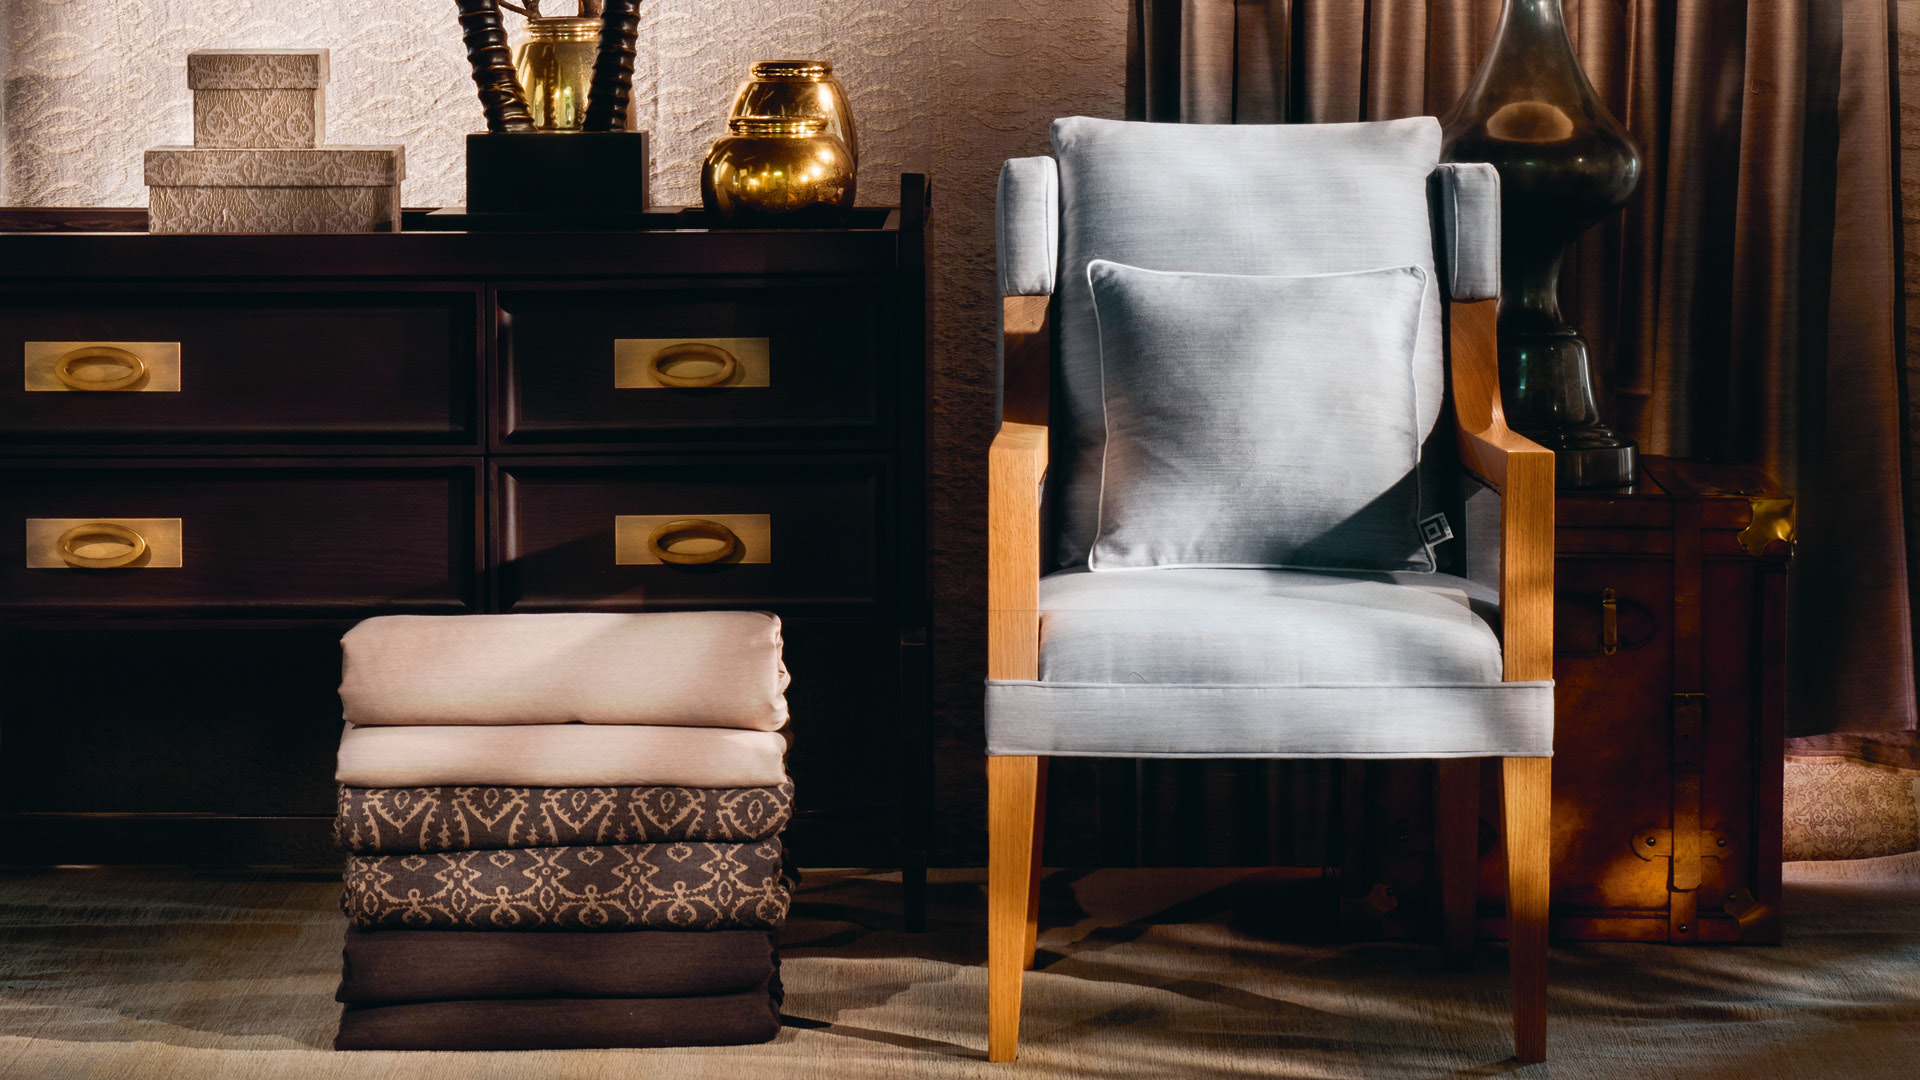 Tessuti Arredamento Per Divani kohro | inspiring interiors and luxury fabrics - home page